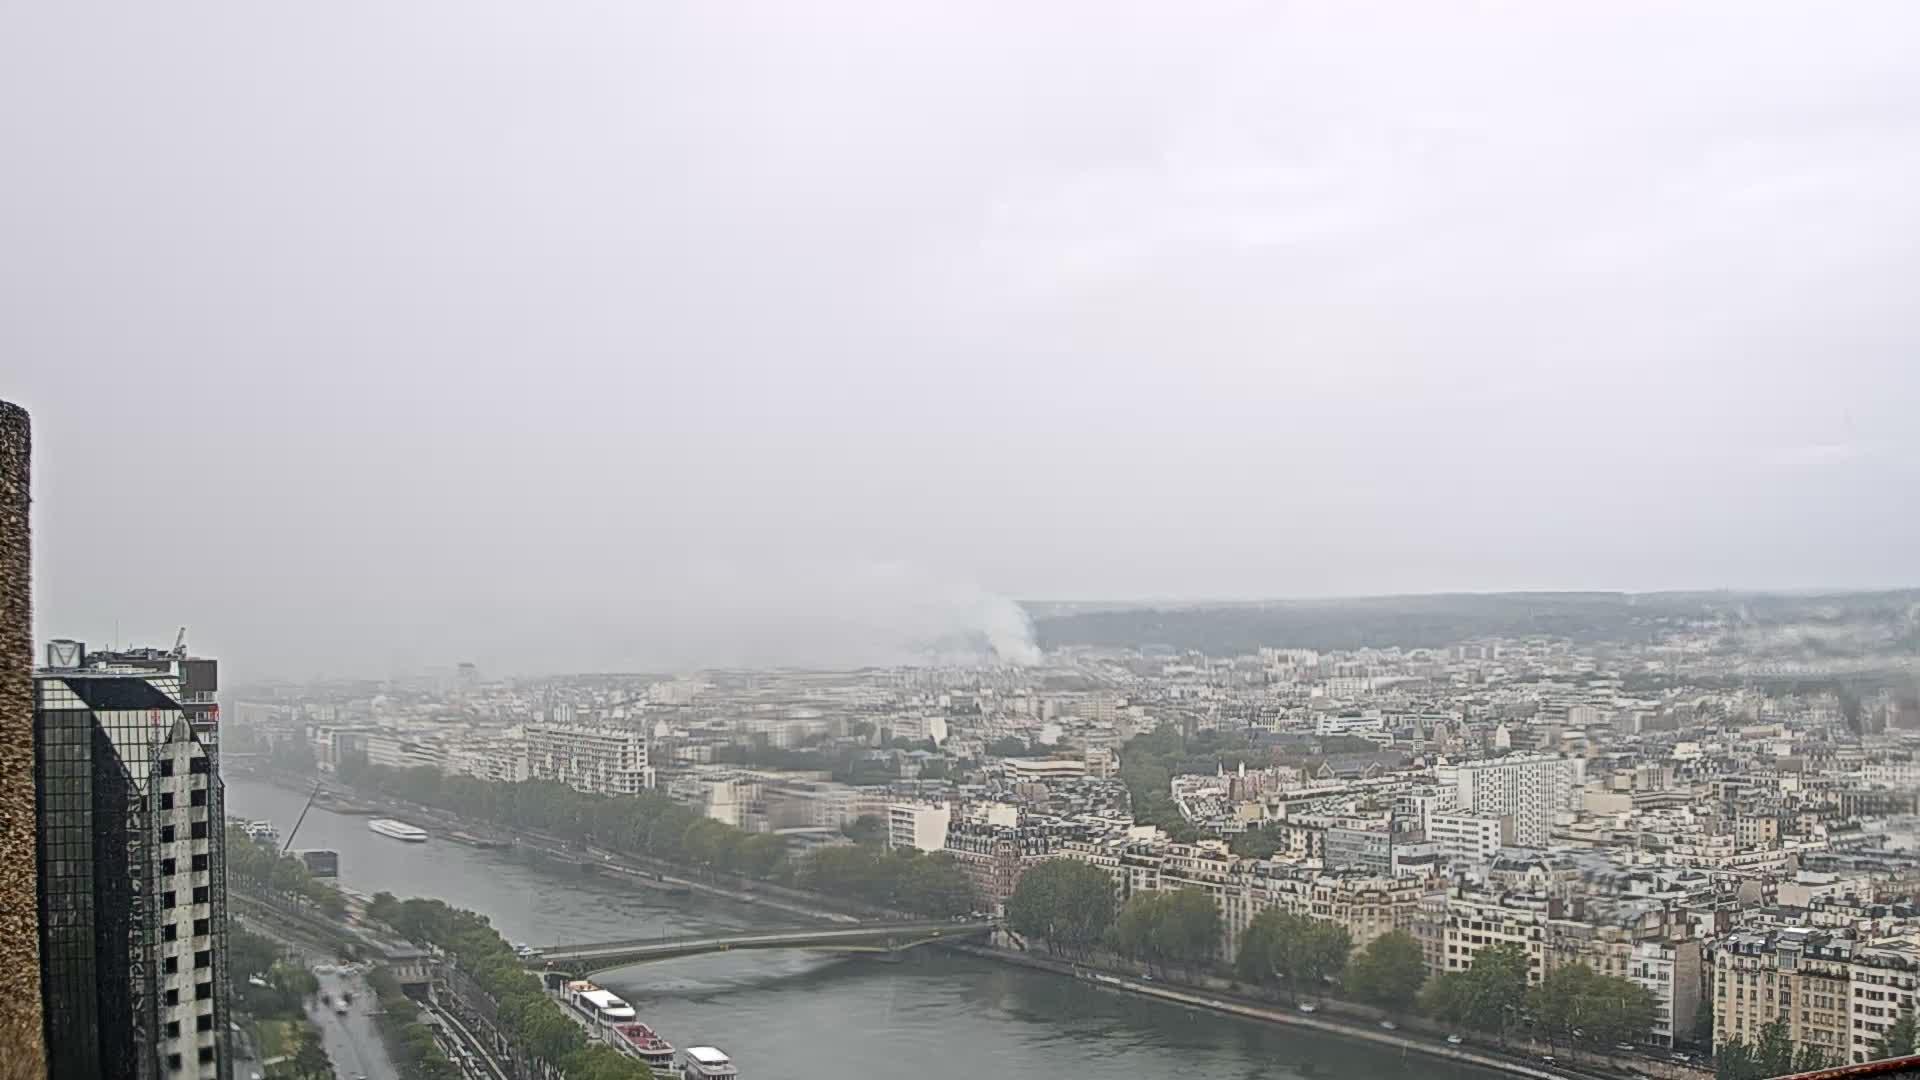 Parigi Gio. 16:24